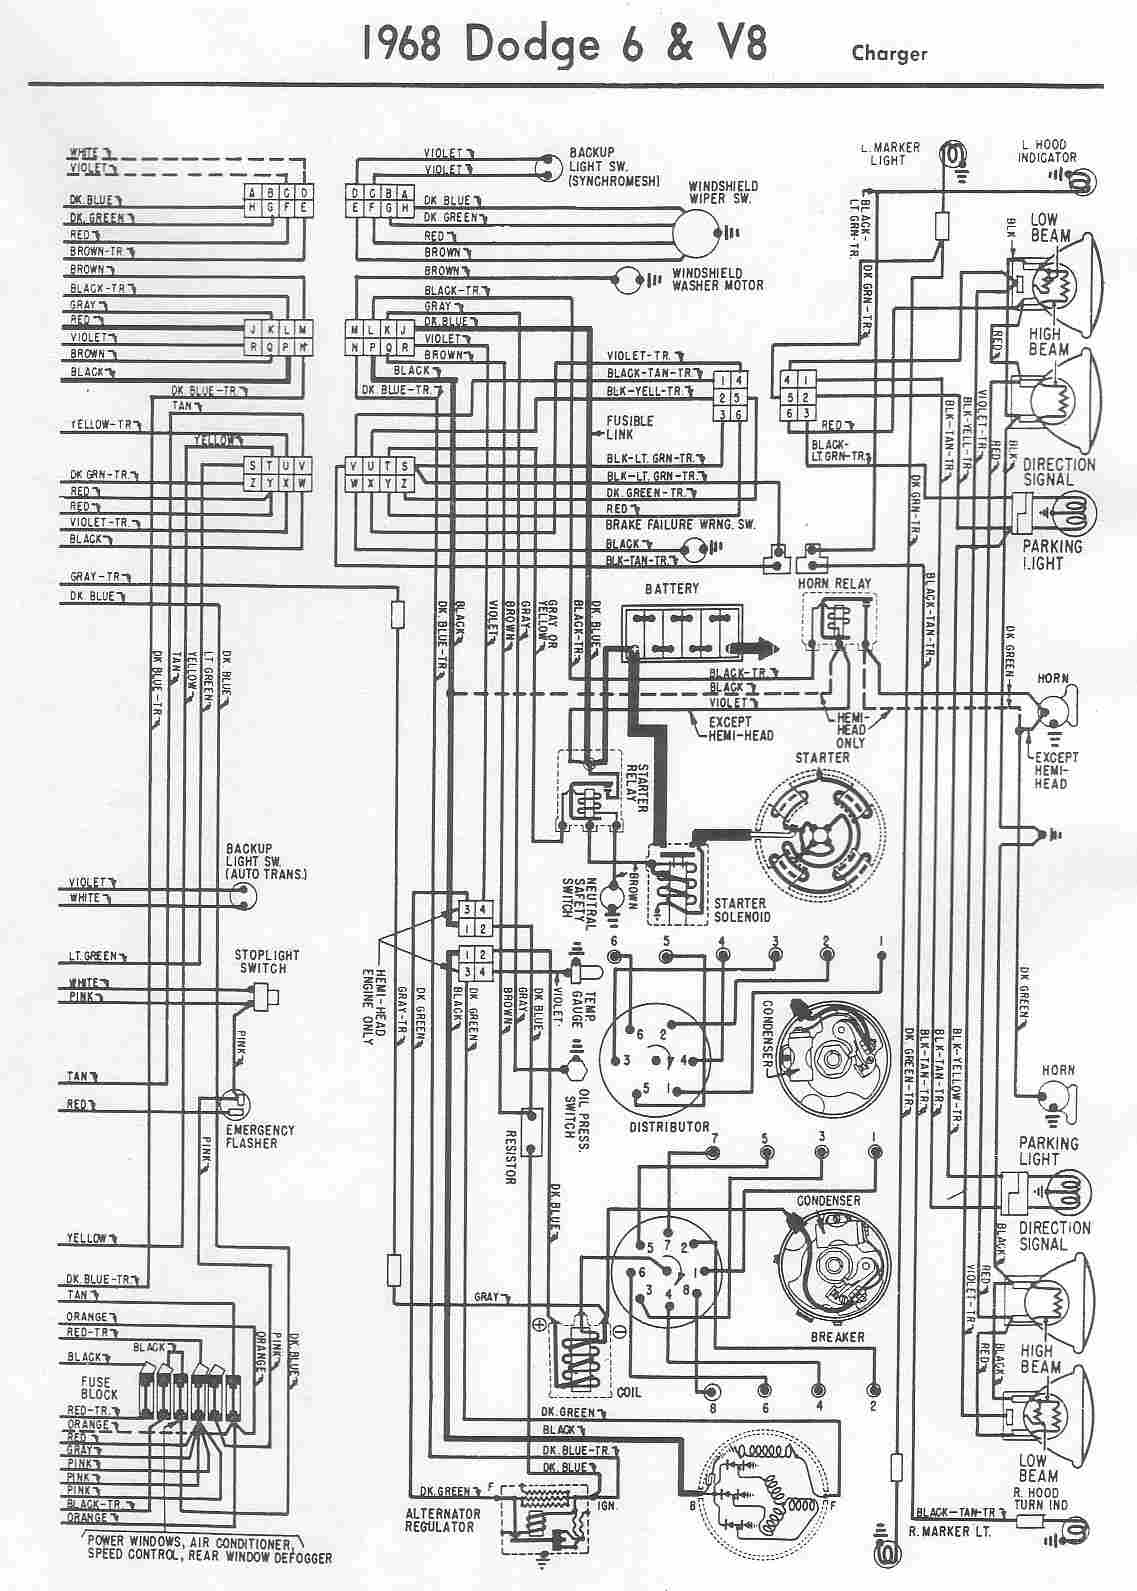 medium resolution of 2000 dodge neon ignition switch diagram wiring schematic 1999 neon wiring harness 2000 plymouth neon wiring